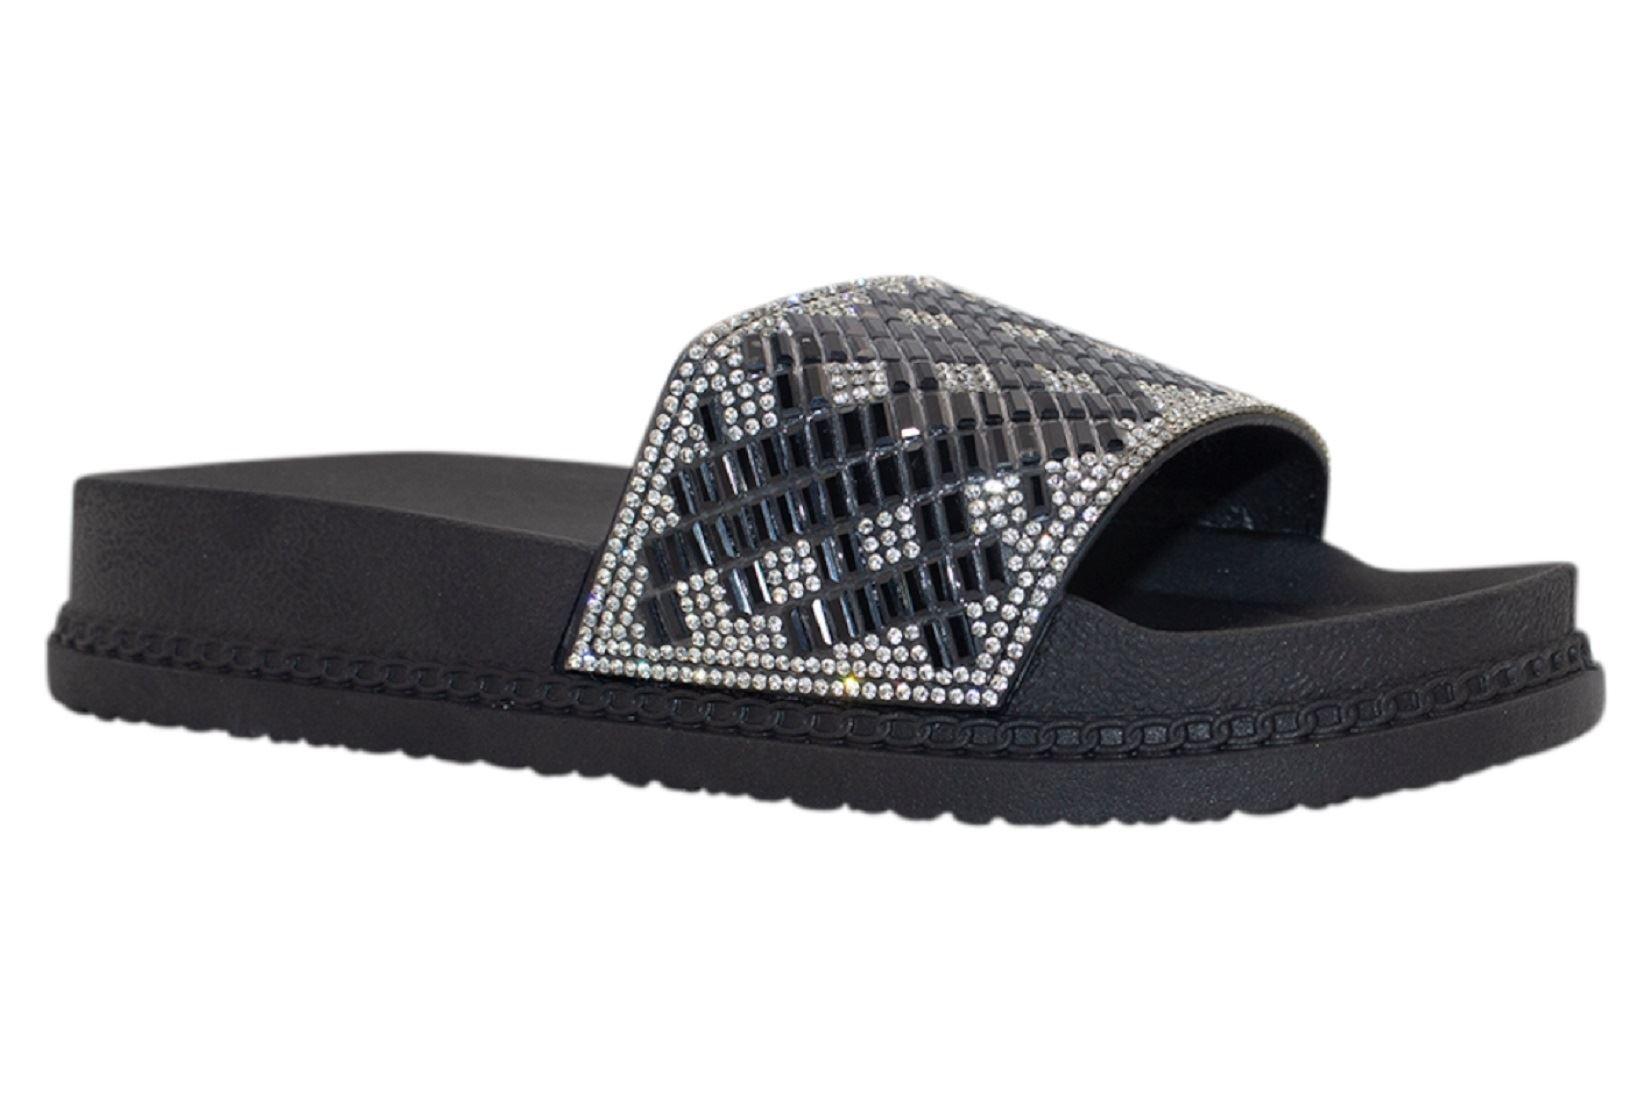 Womens-Sliders-Casual-Slippers-Mules-Ladies-Diamante-Flip-Flop-Sandals-Shoes thumbnail 94